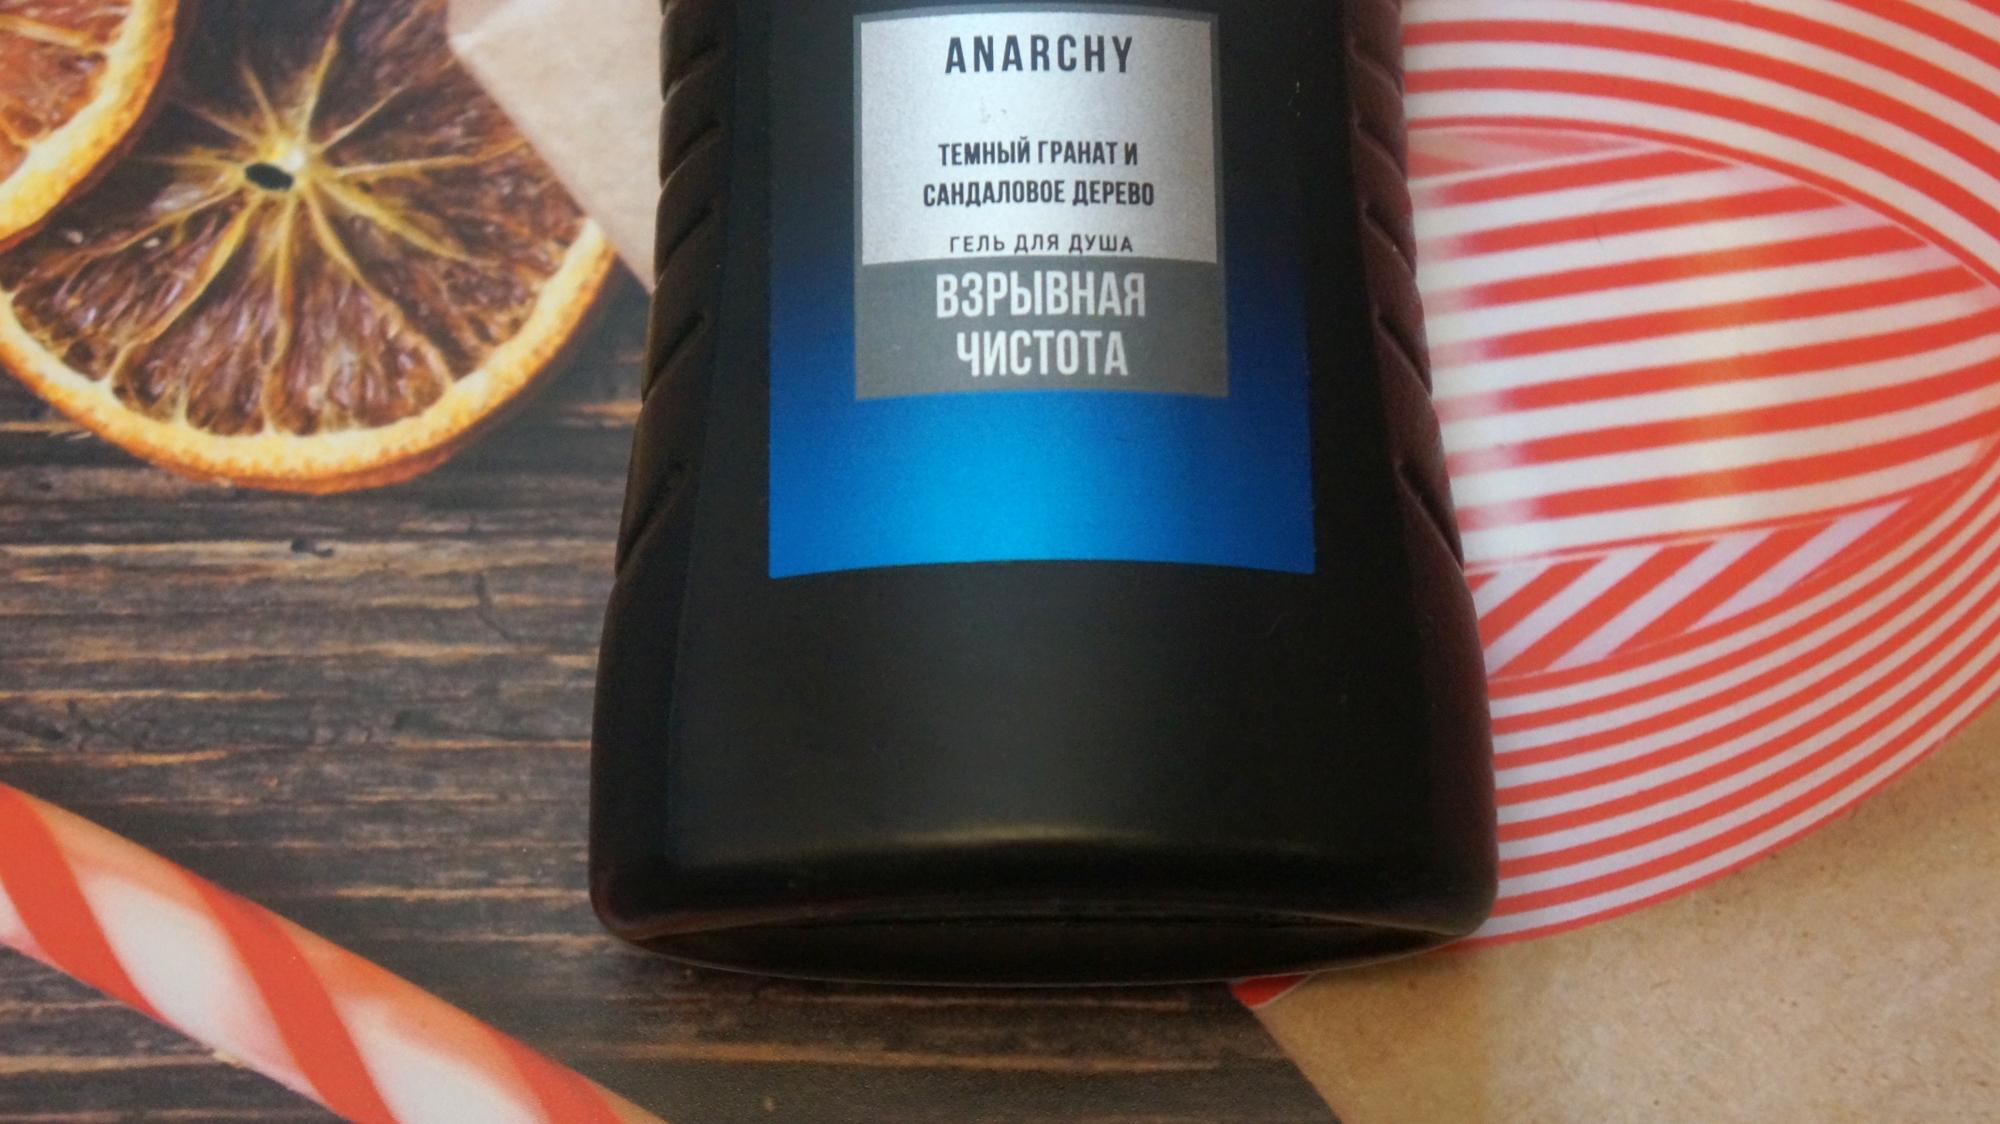 Гель для душа AXE Anarchy